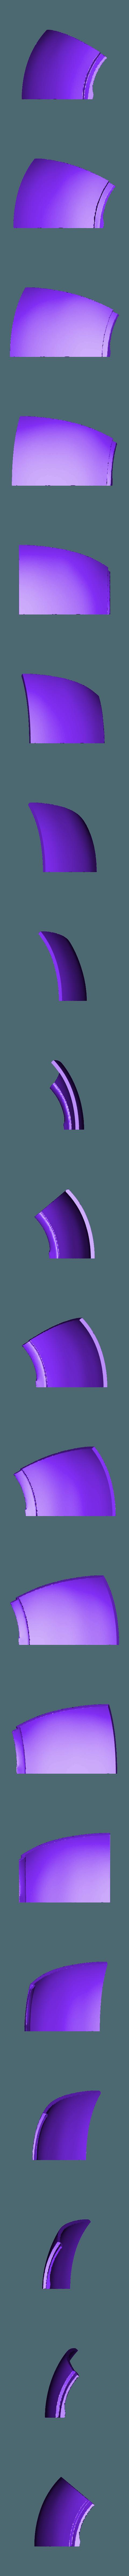 Sniper_Final_Print18.stl Download OBJ file Sniper - Knights of Ren Helmet mask, Star Wars 3D print model • 3D printable model, 3D-mon